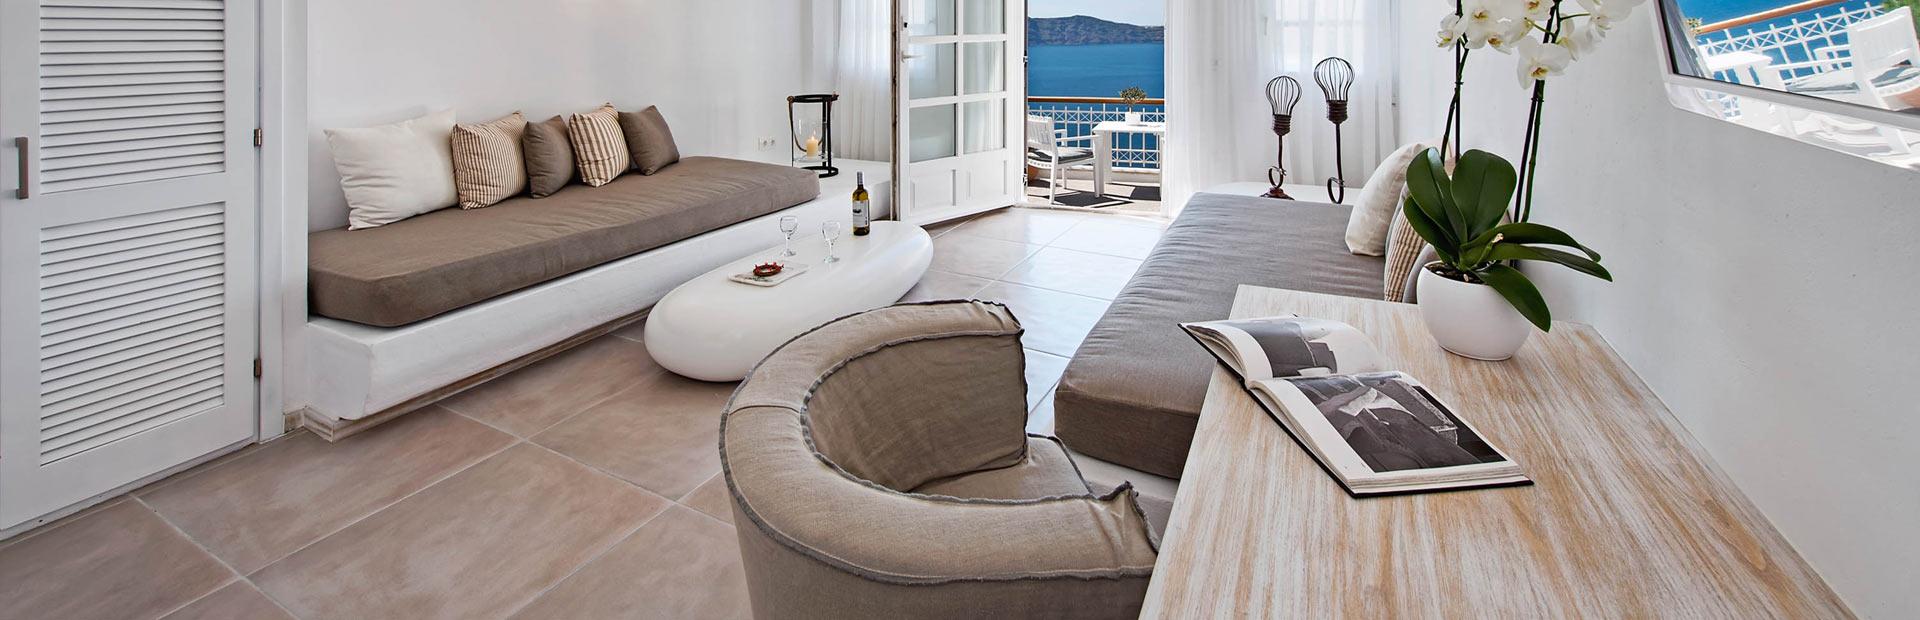 Athina Luxury Suites - Best Hotels In Santorini